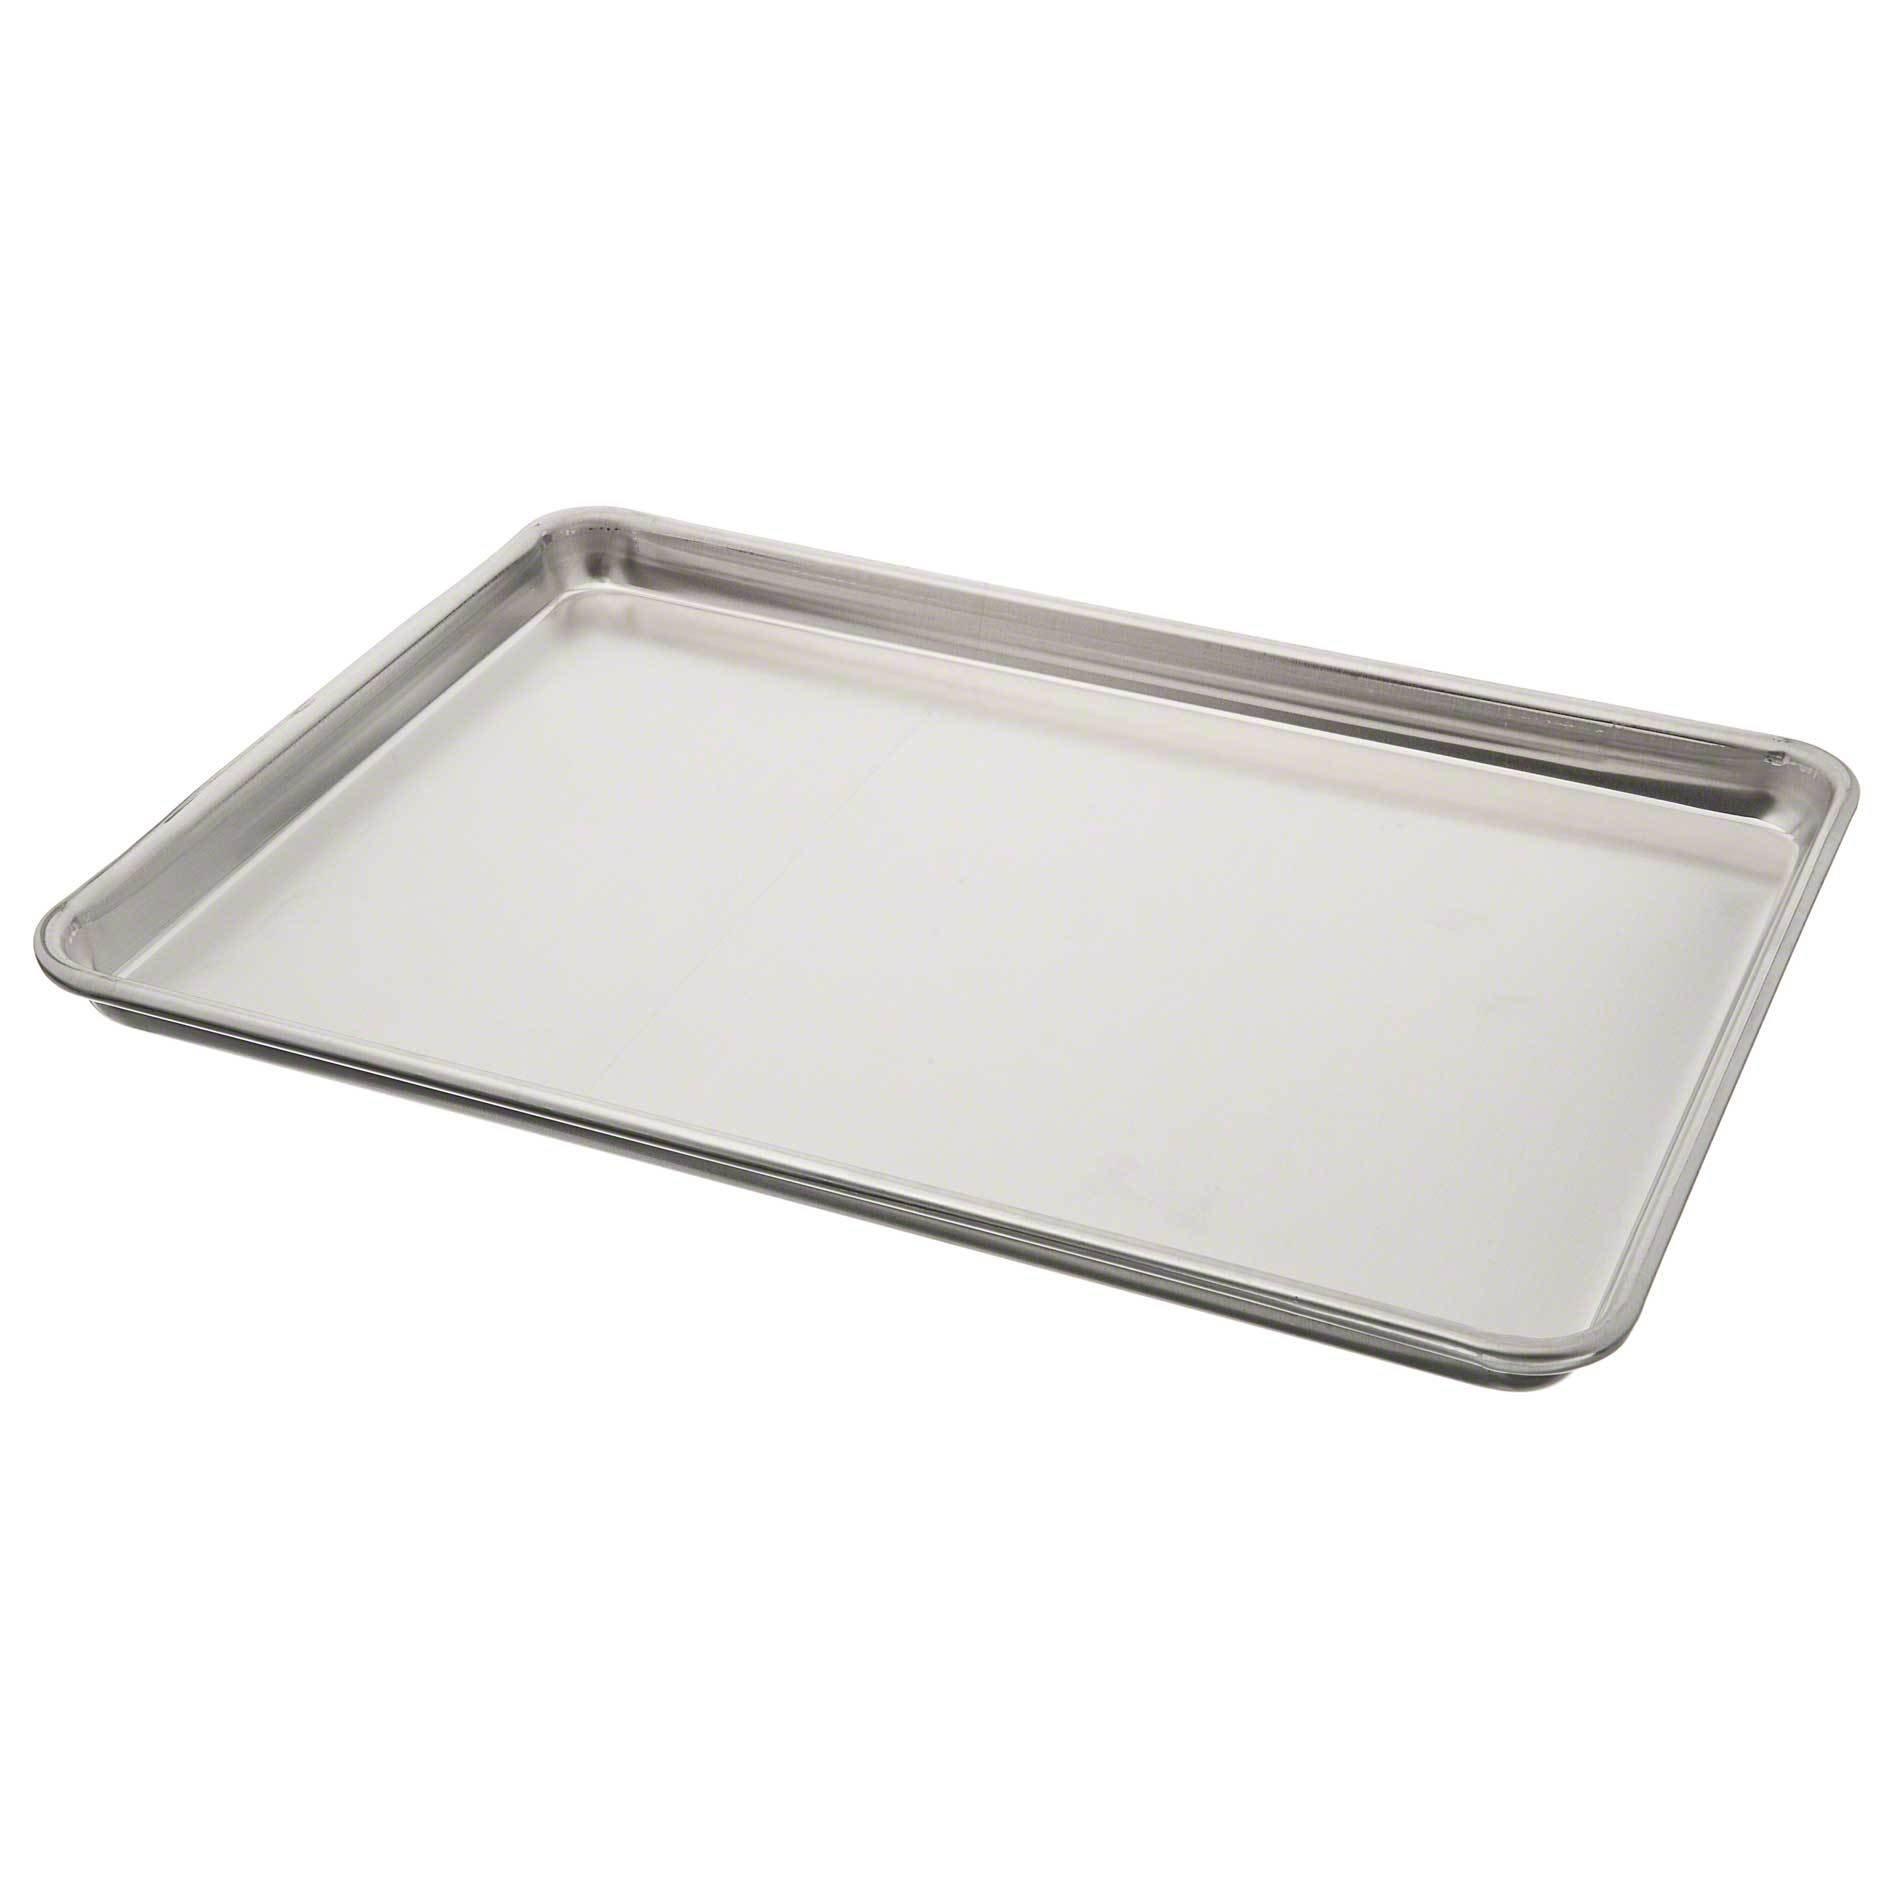 Vollrath (5303) Wear-Ever Half-Size Sheet Pan (18-Inch x 13-Inch, Aluminum)